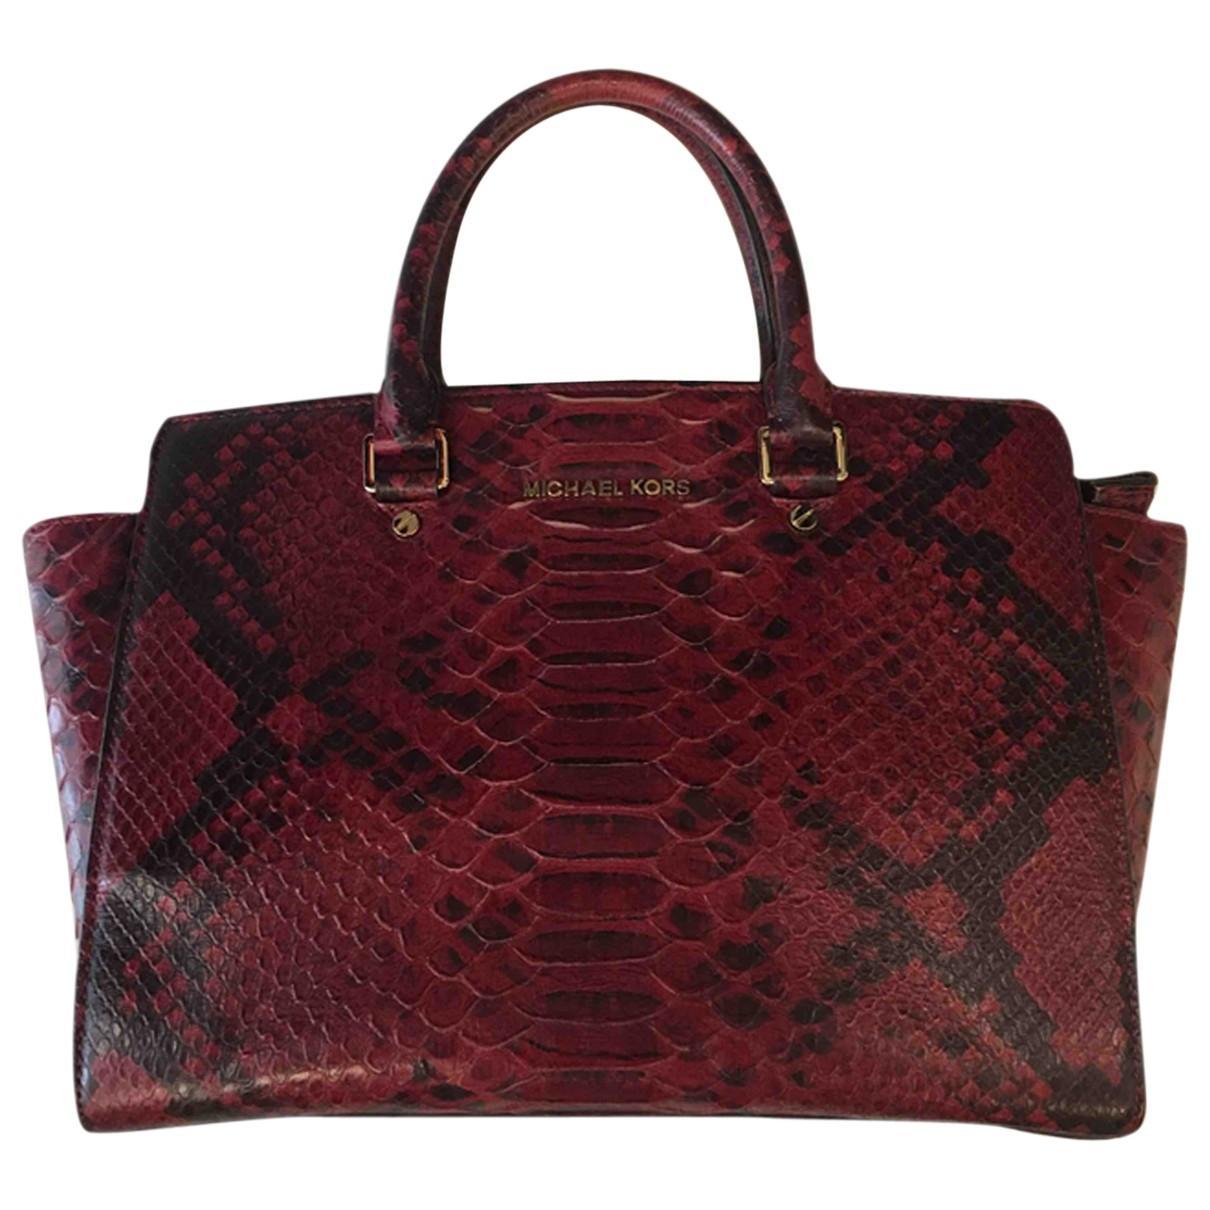 ... Burgundy Python Handbag - Lyst. View fullscreen d735e63b77599